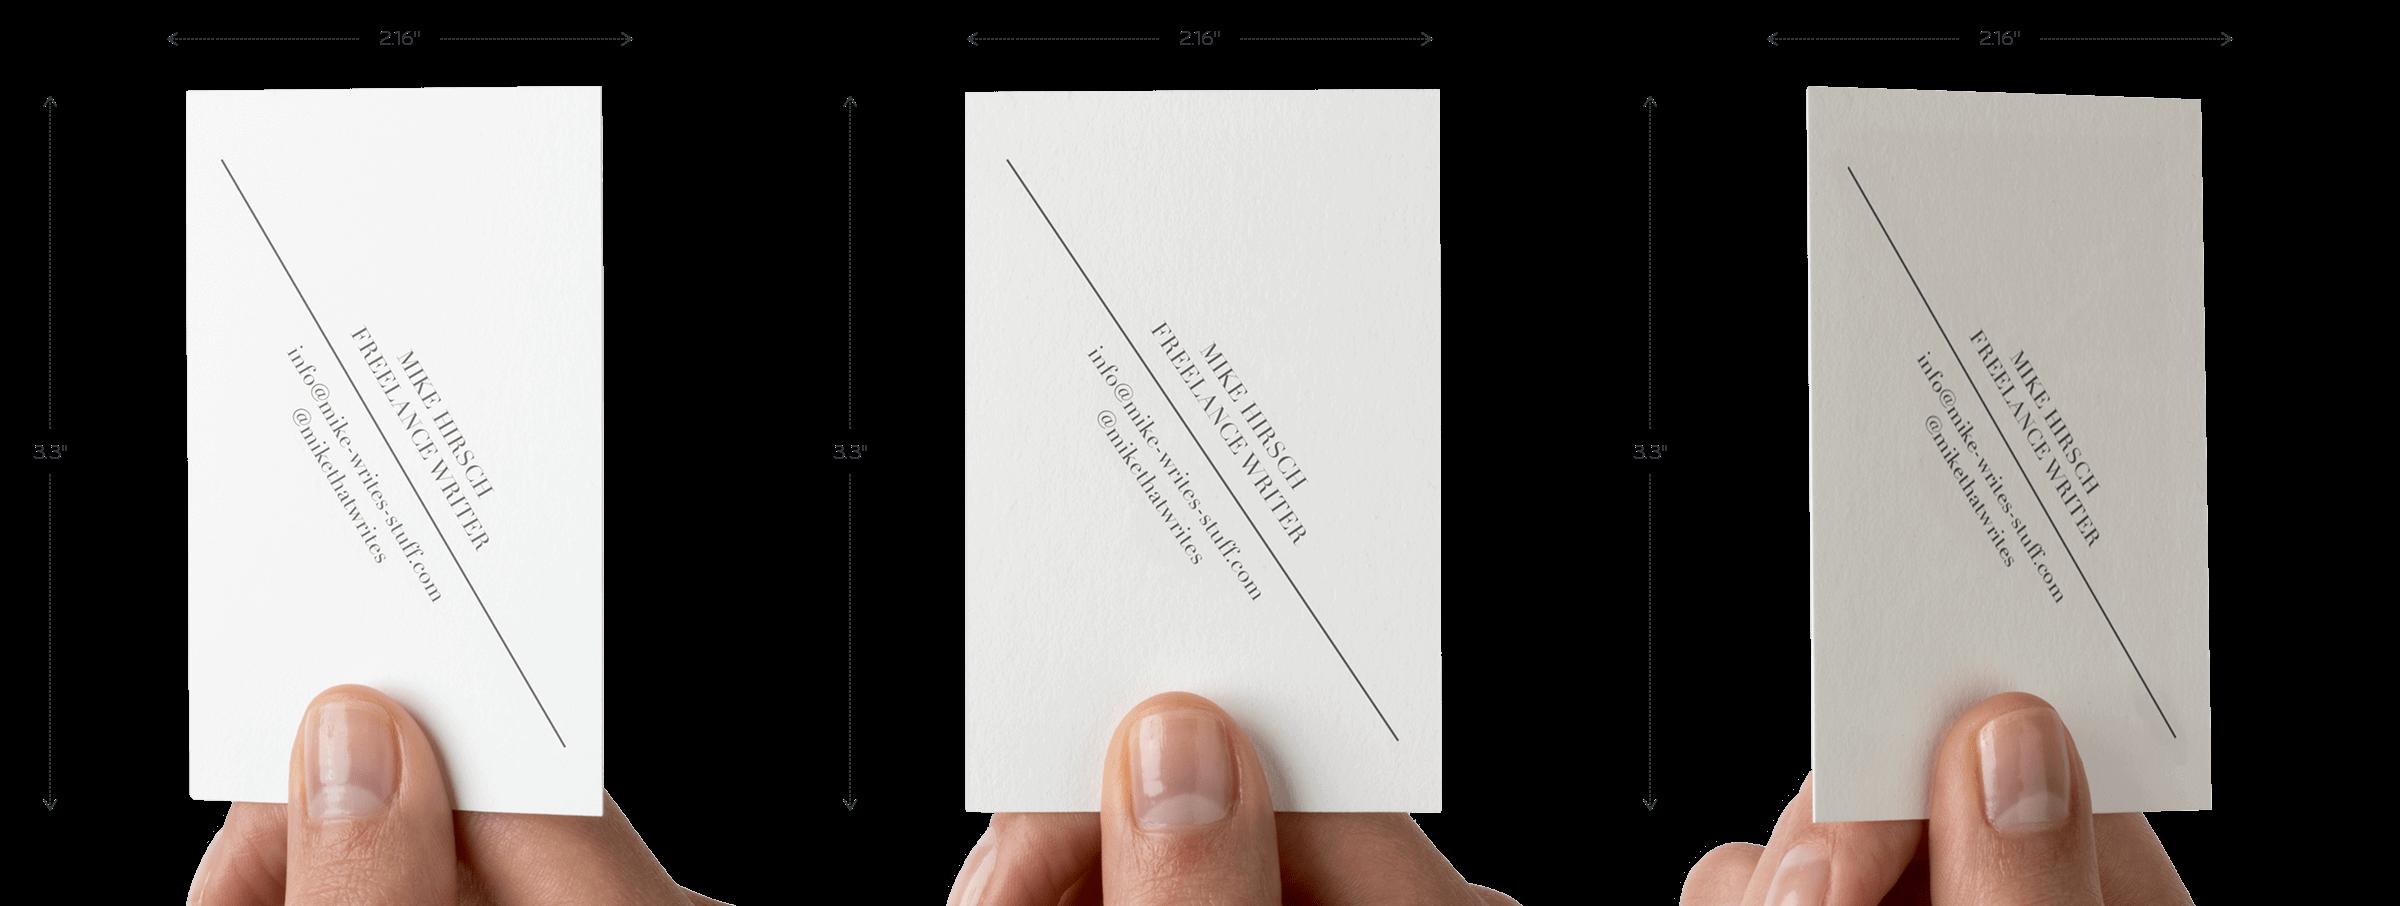 2.16″ x 3.3″ Cotton Business Cards